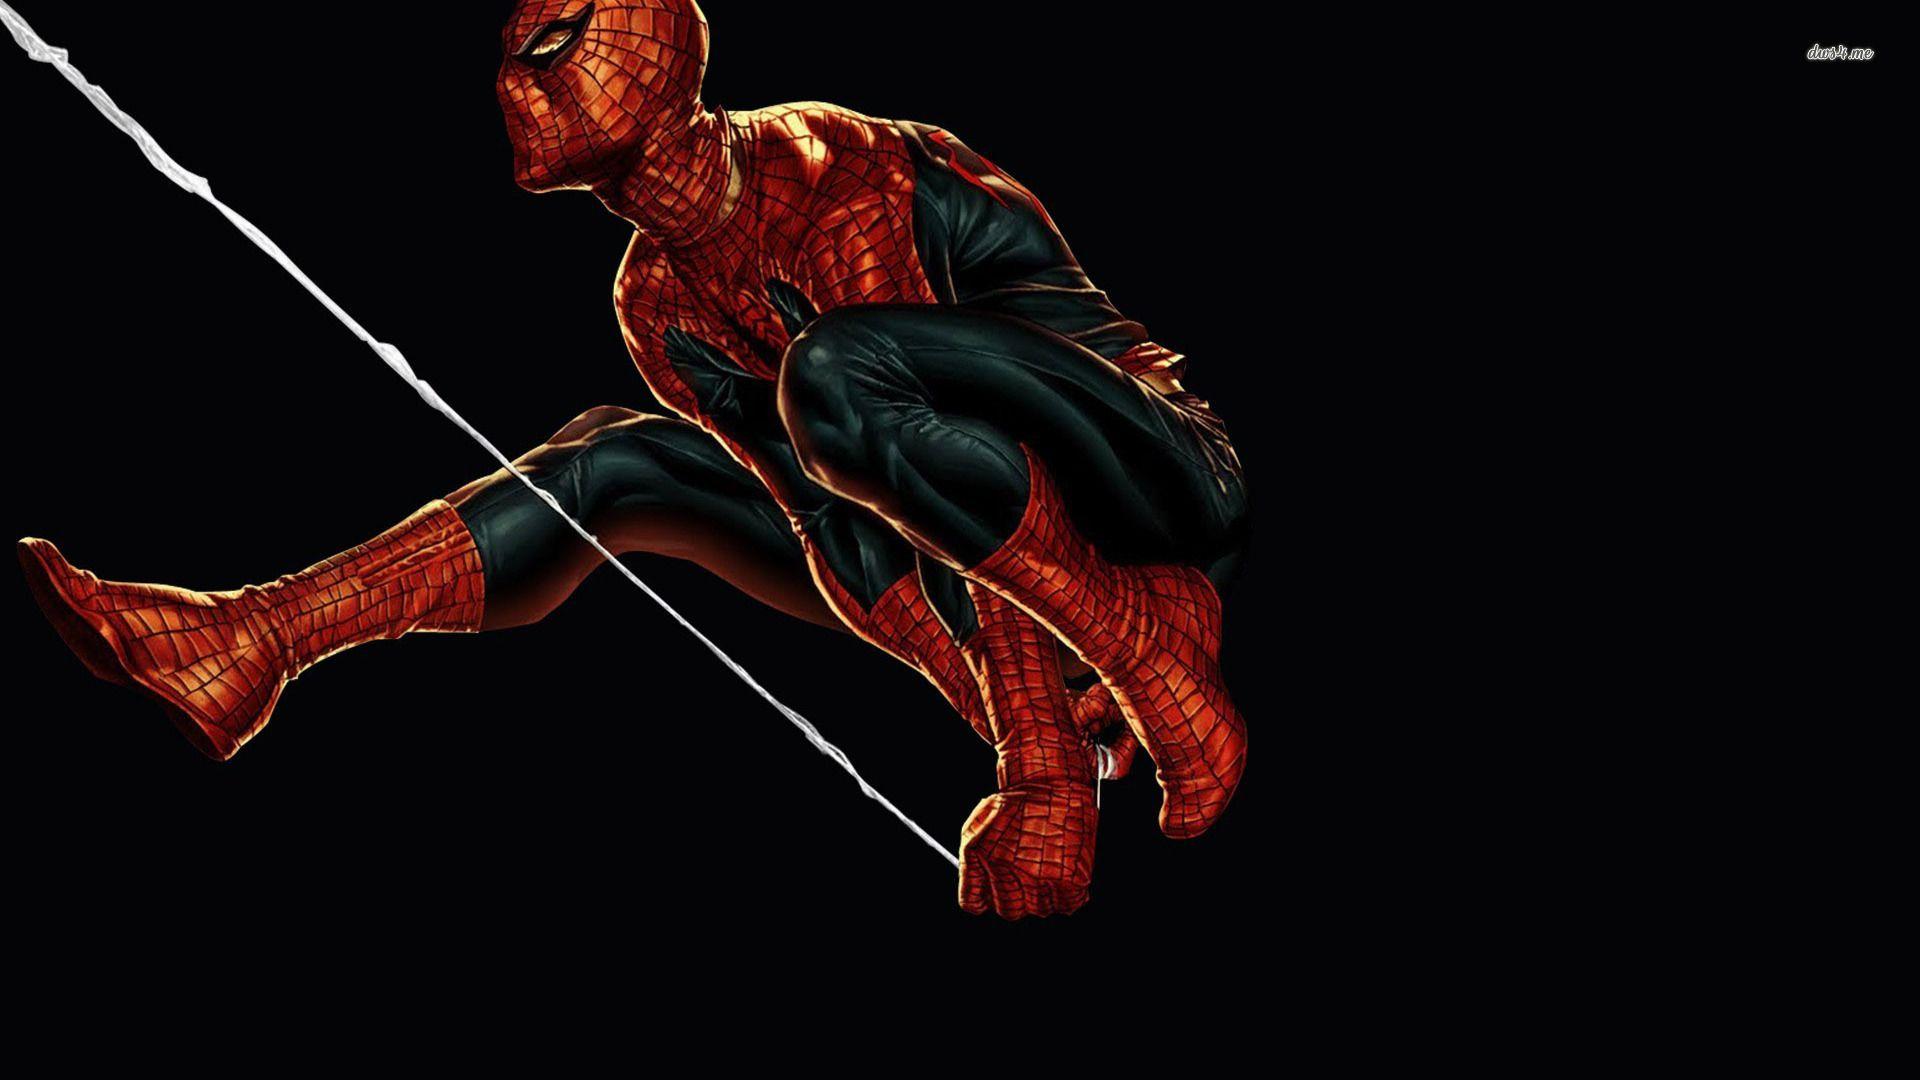 Download Wallpaper Home Screen Spiderman - 80101e726f64294794a0fbd2caf259e7  Photograph_44922.jpg